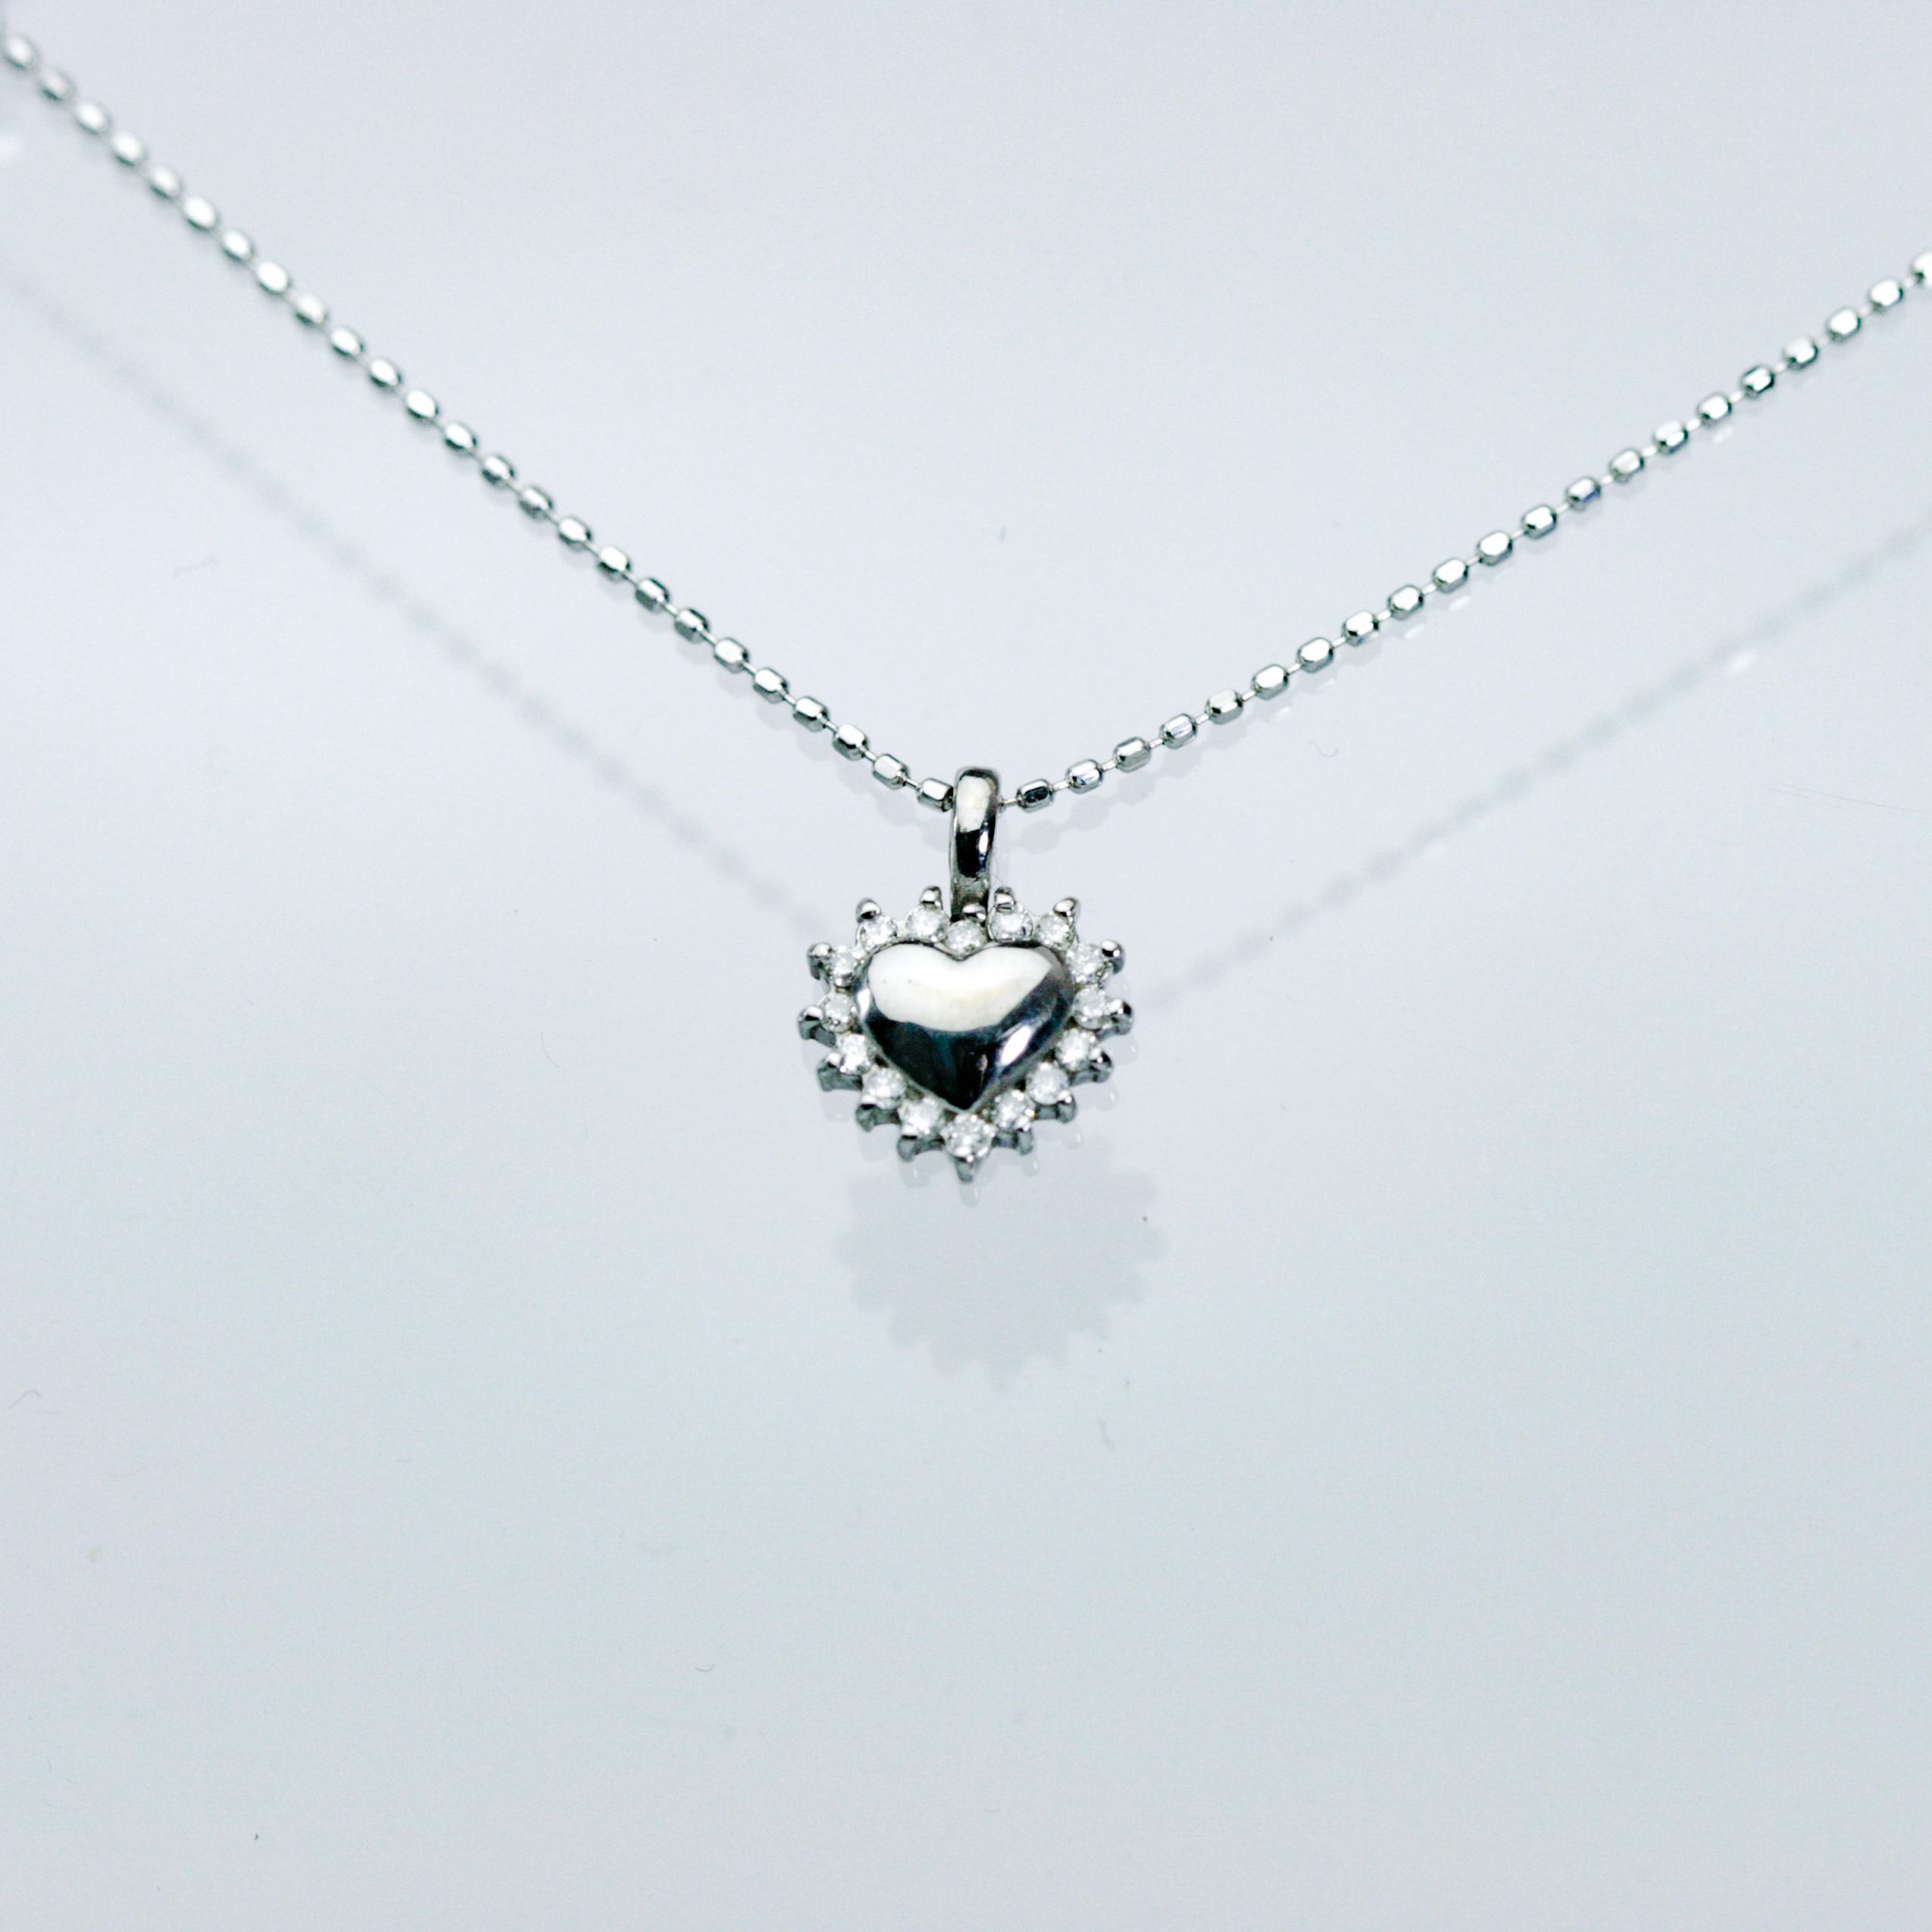 K18ホワイトゴールド ハートXダイヤモンドのペンダント